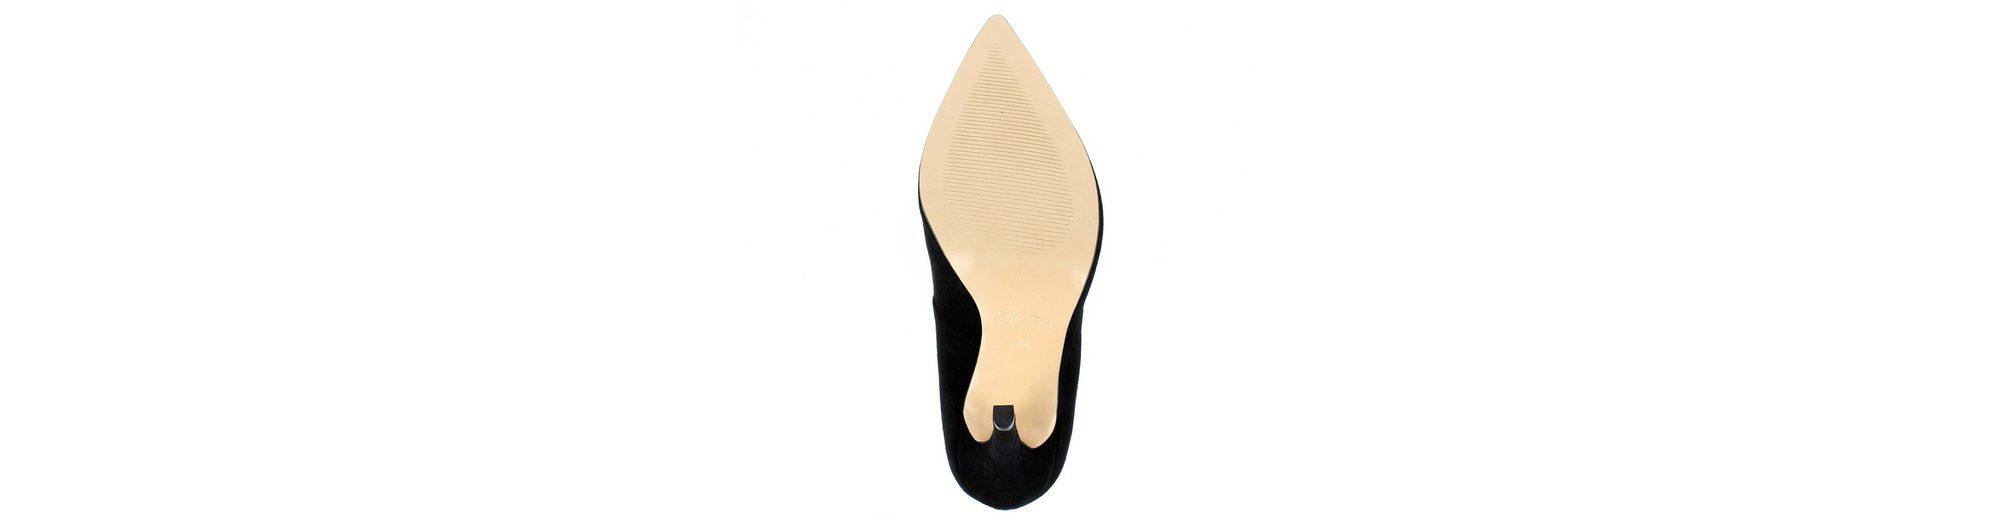 Evita LISA Heel LISA Pumps Heel High Evita LISA Pumps High High Evita 44rBwH